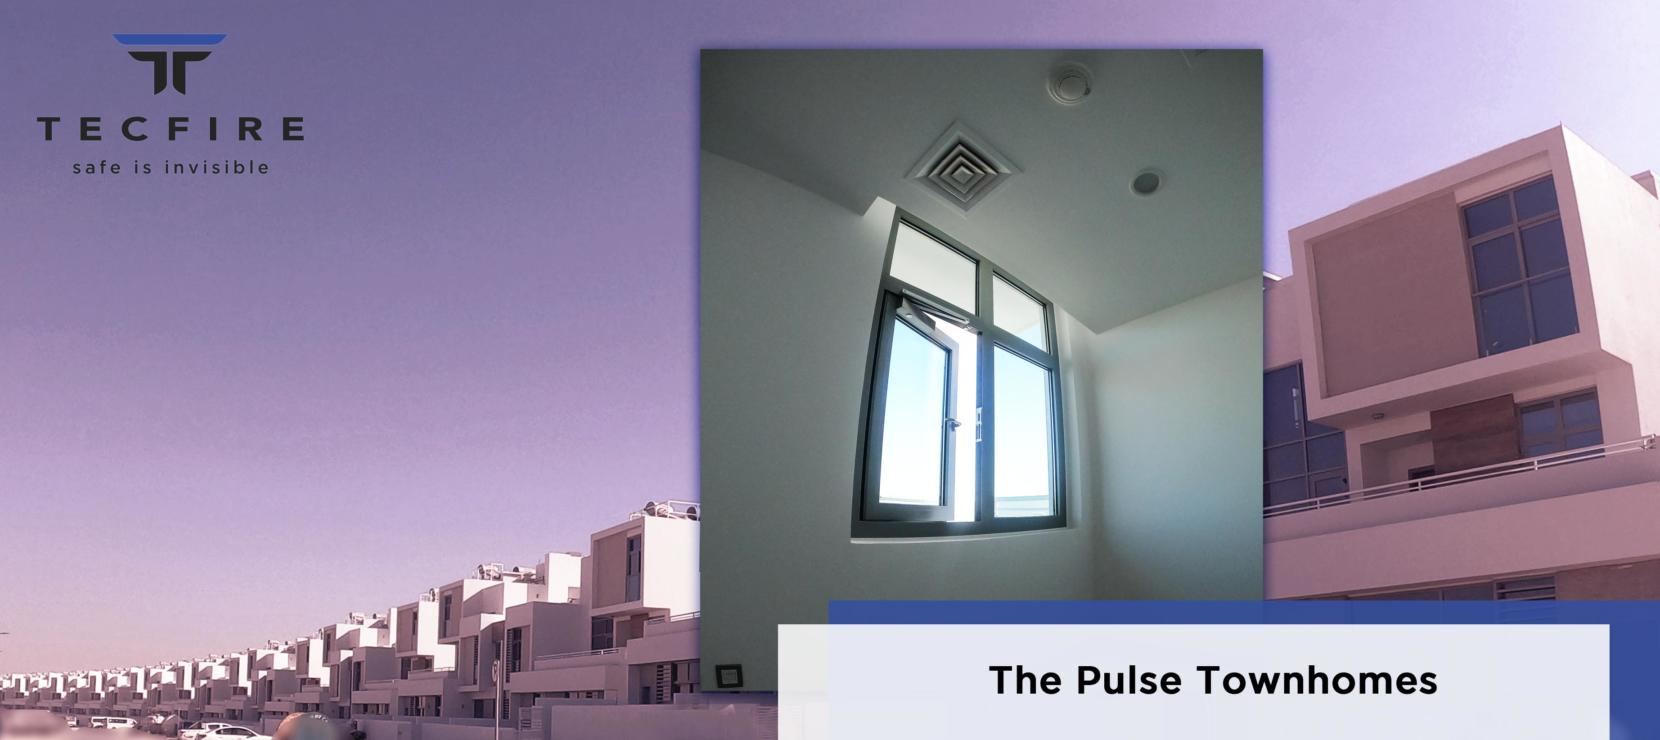 Installation in the Dubai South